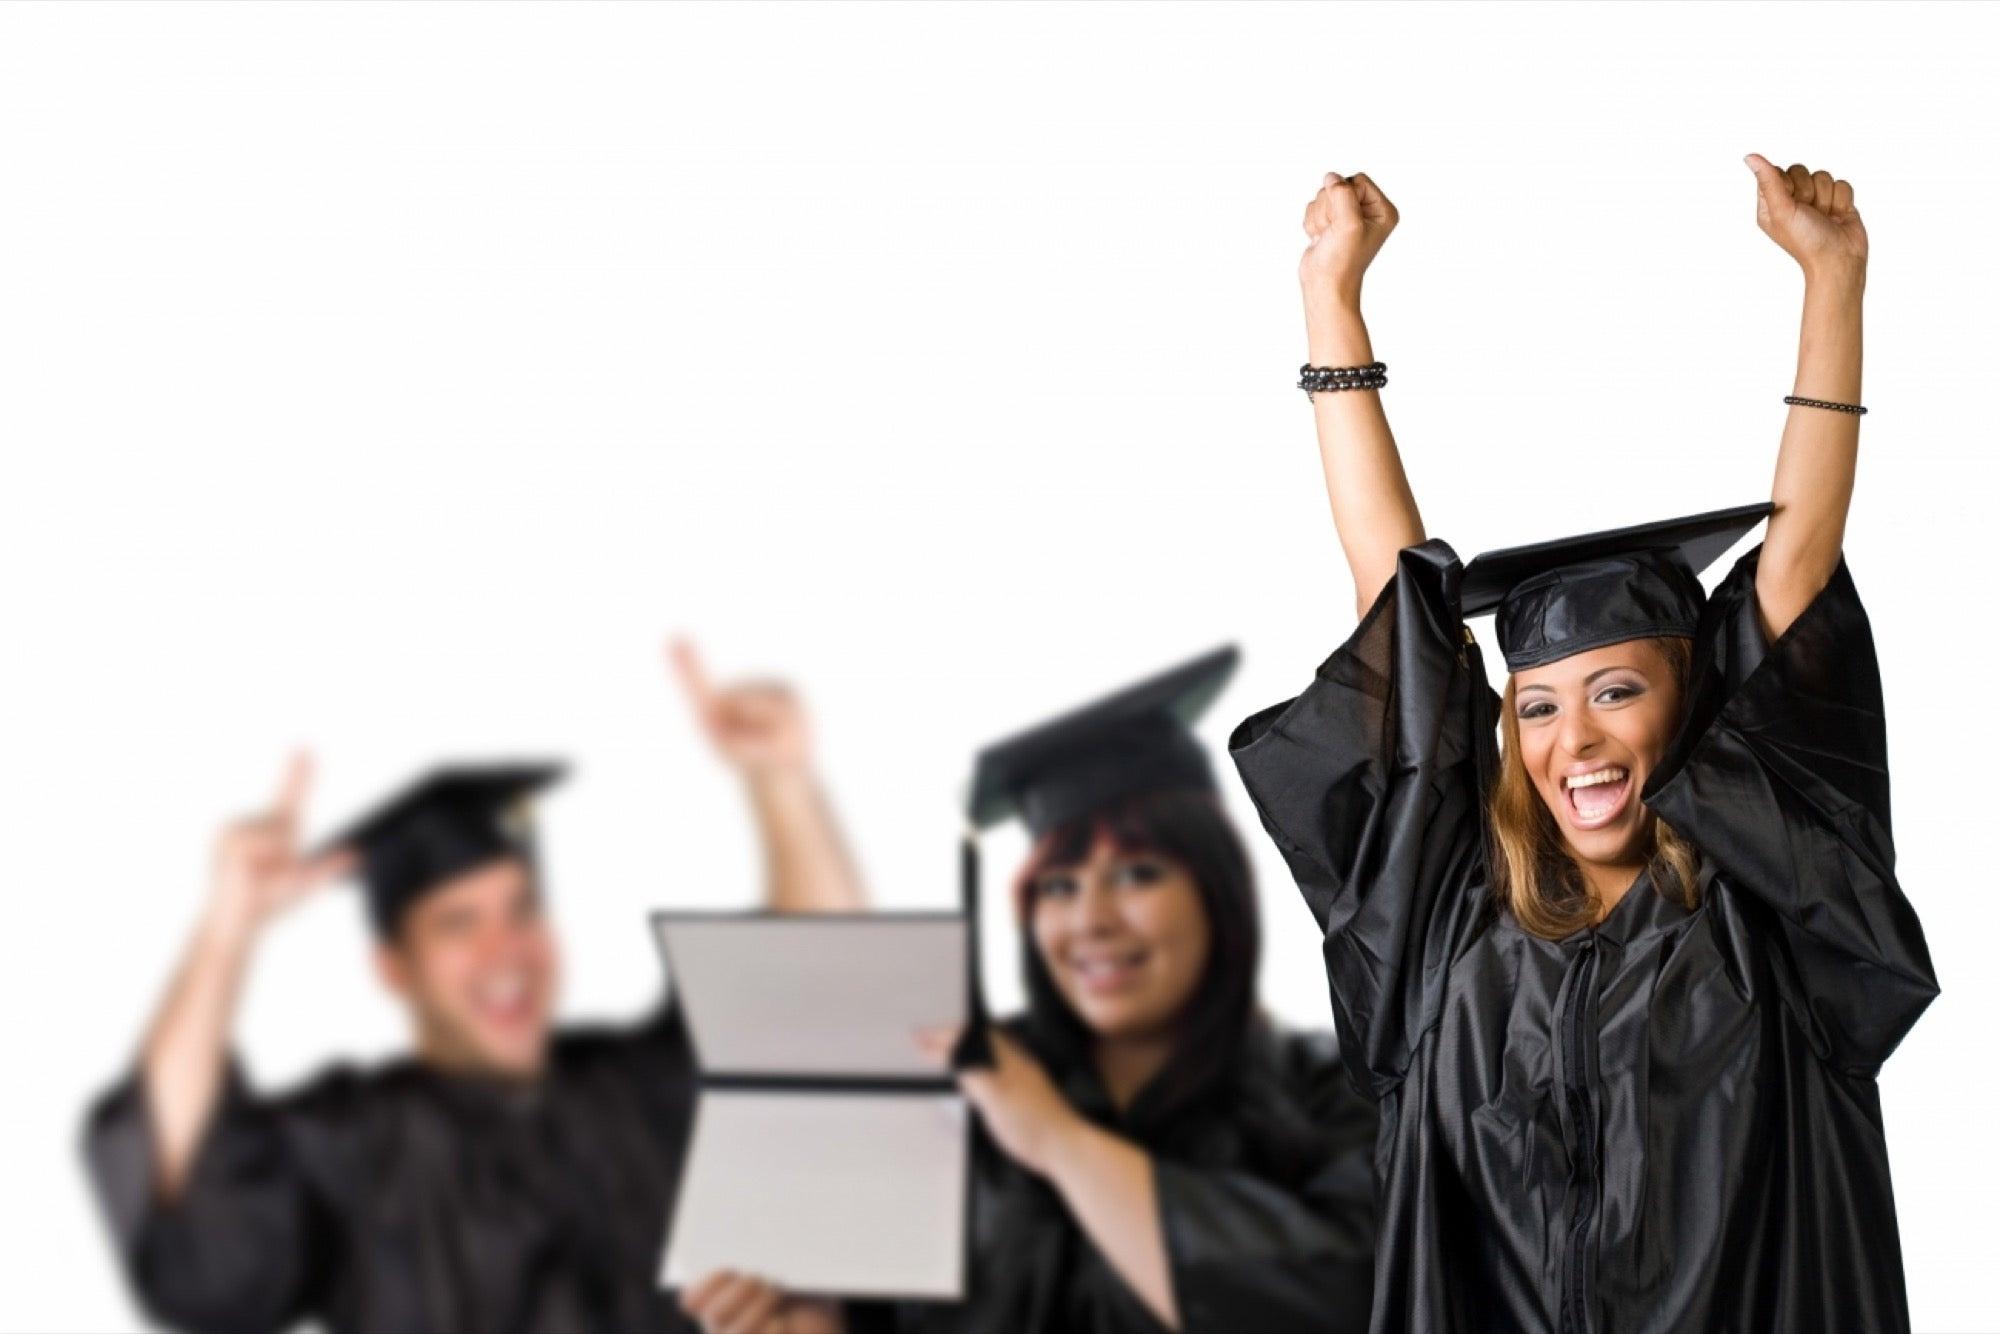 Hiring Fresh Graduates? Make Sure You Don't Make These Mistakes